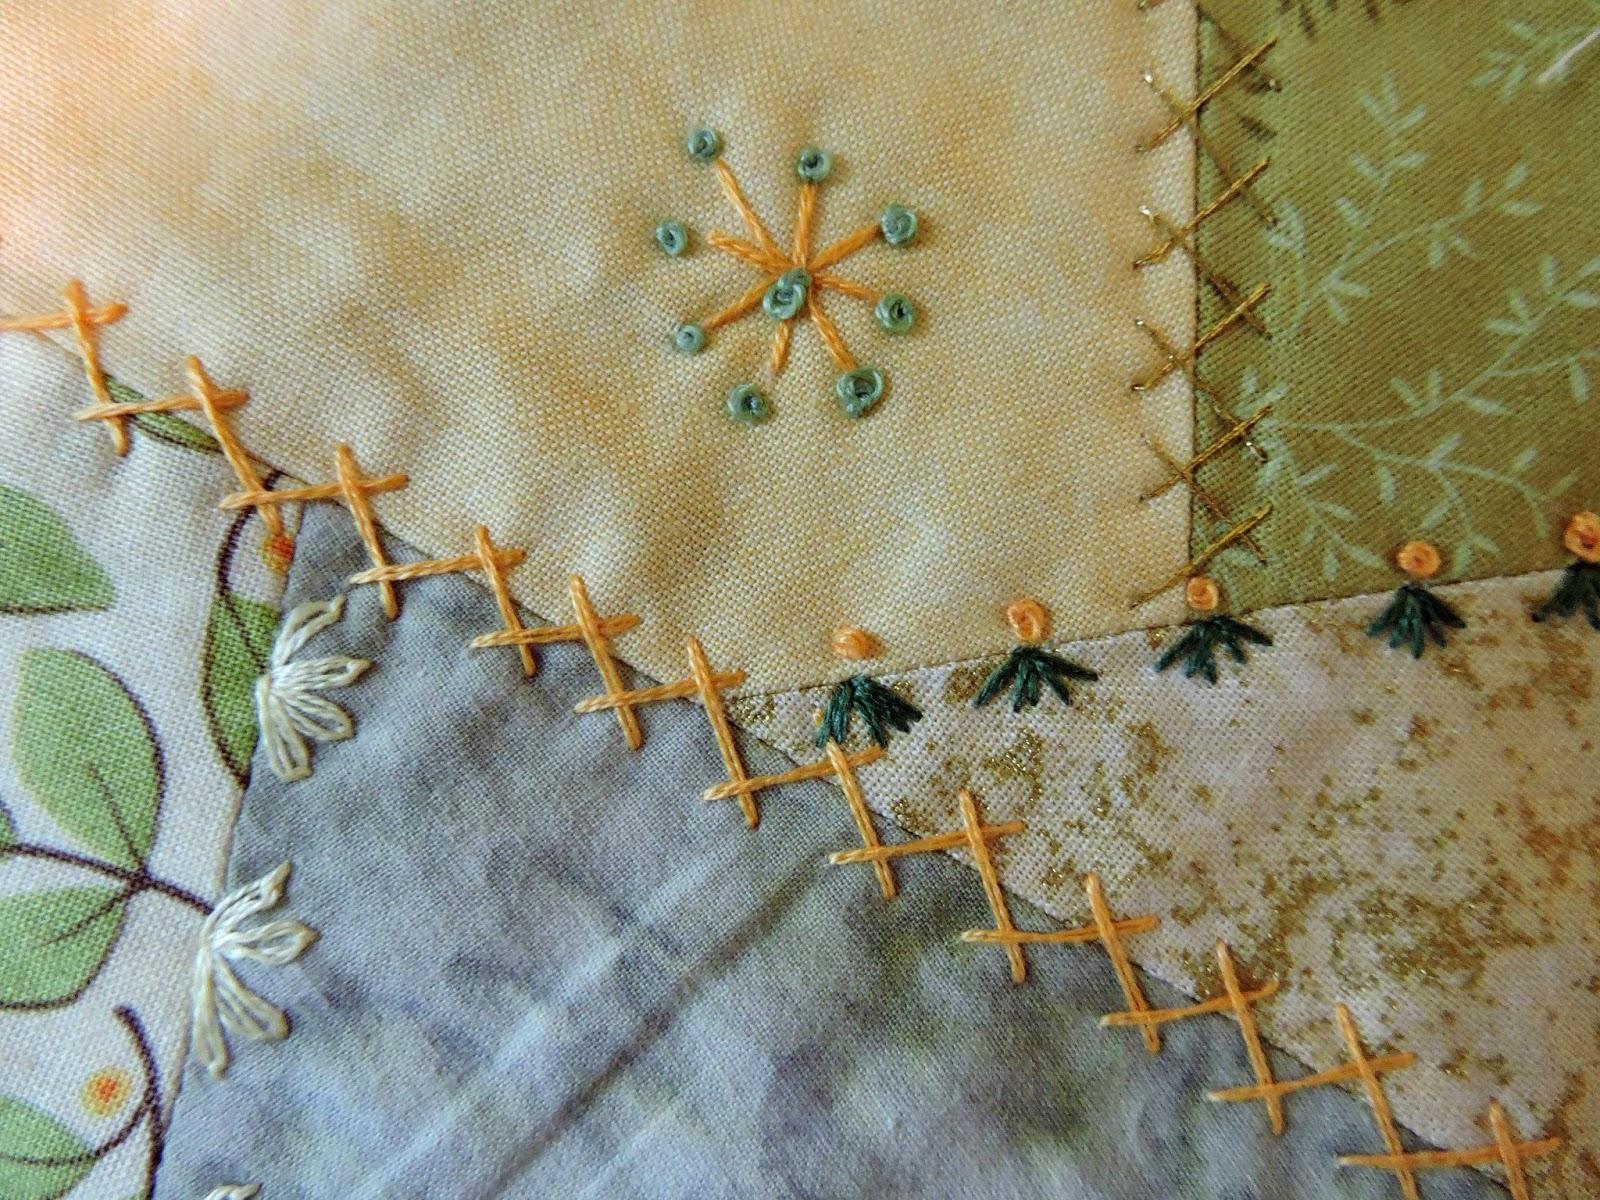 Somerset Stitch Basic Hand Embroidery Stitches